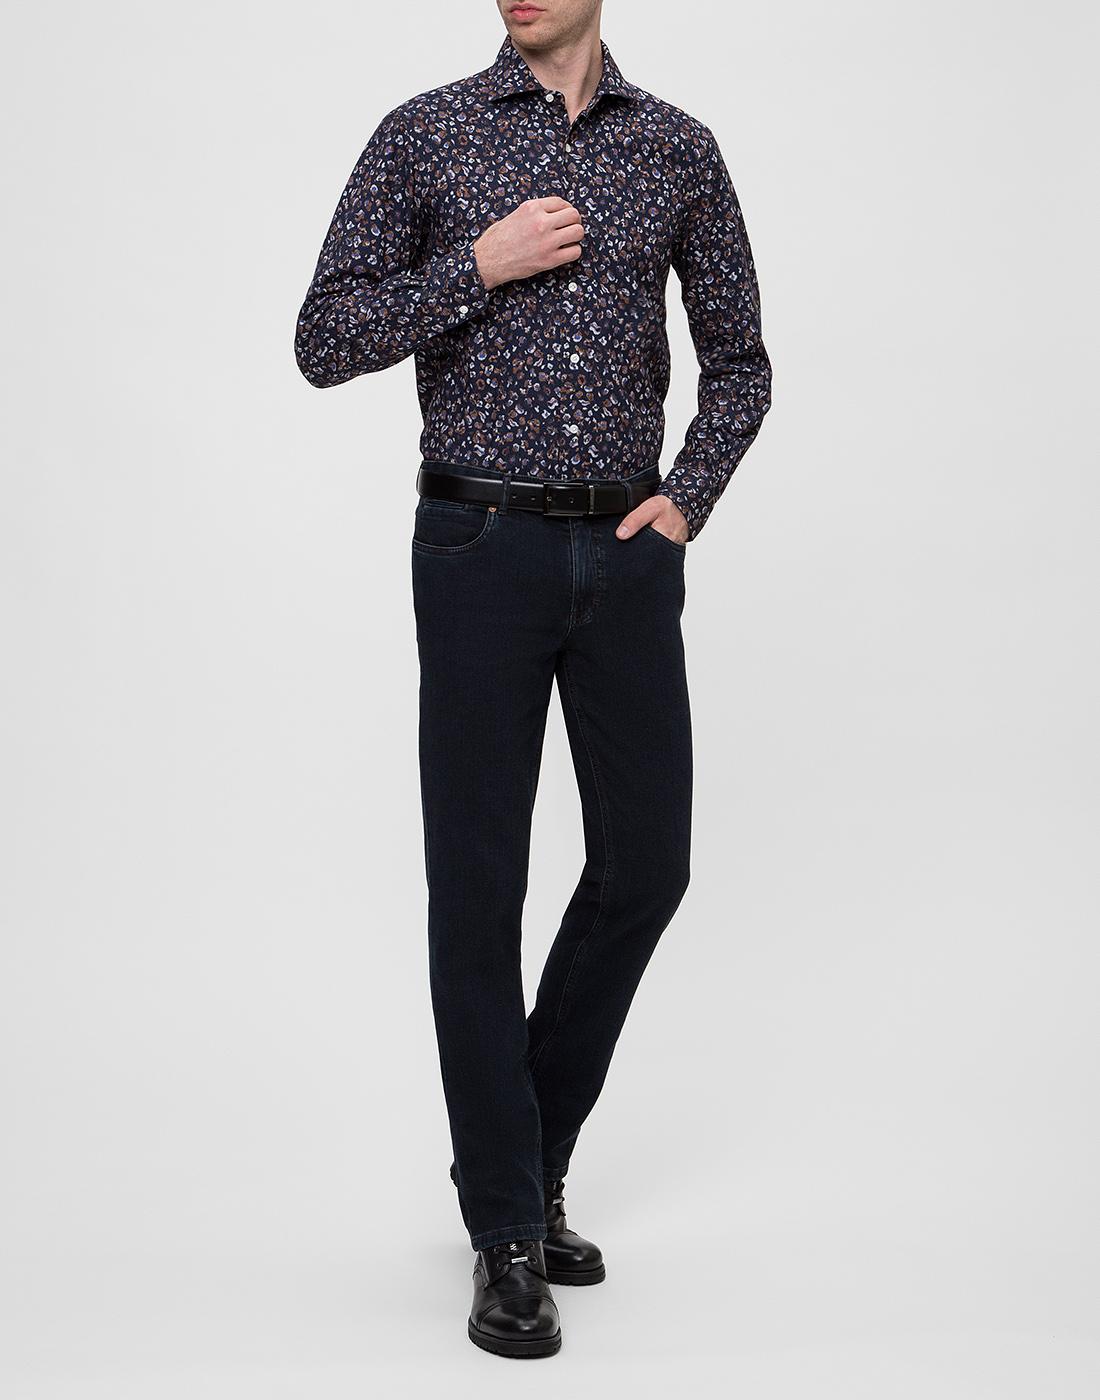 Мужская синяя рубашка Barba SD2U133606501U-5